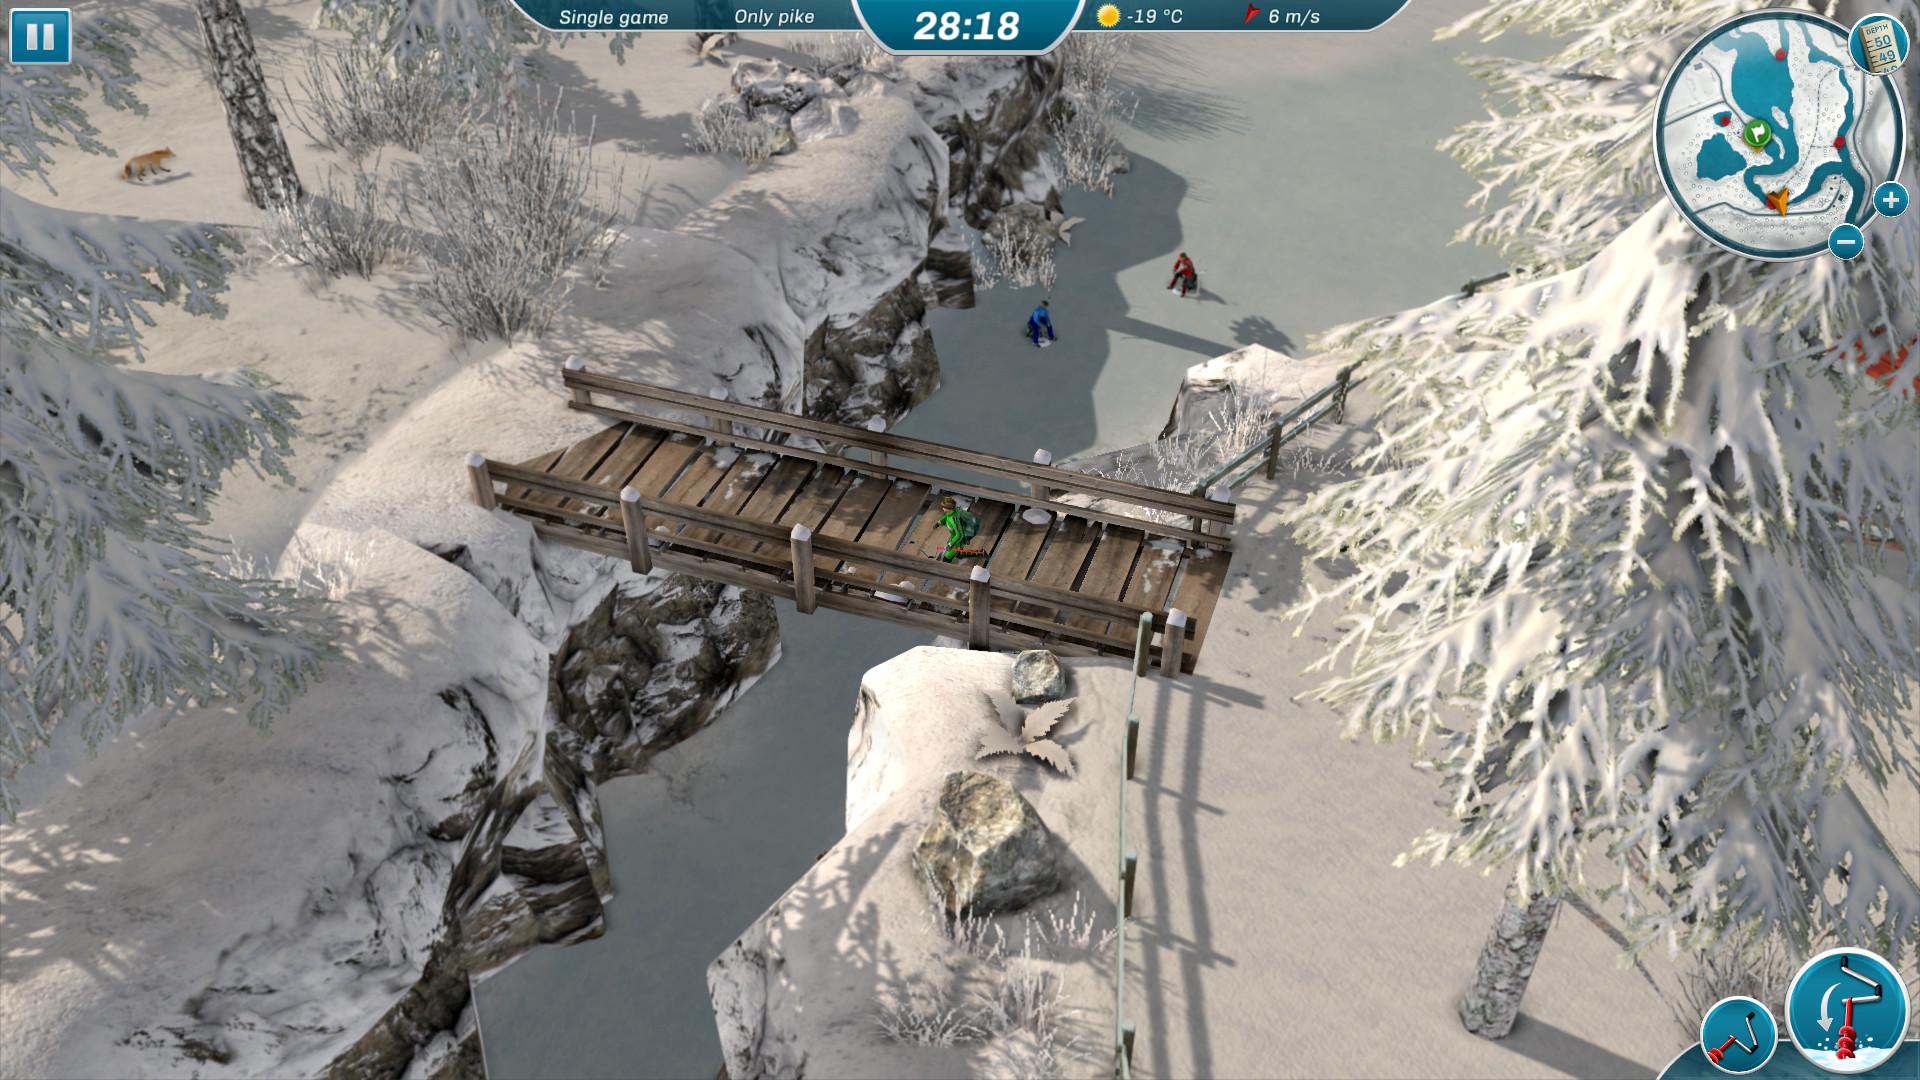 <b>《冰湖钓鱼》Steam上好评不断 冰面垂钓乐趣无穷</b>